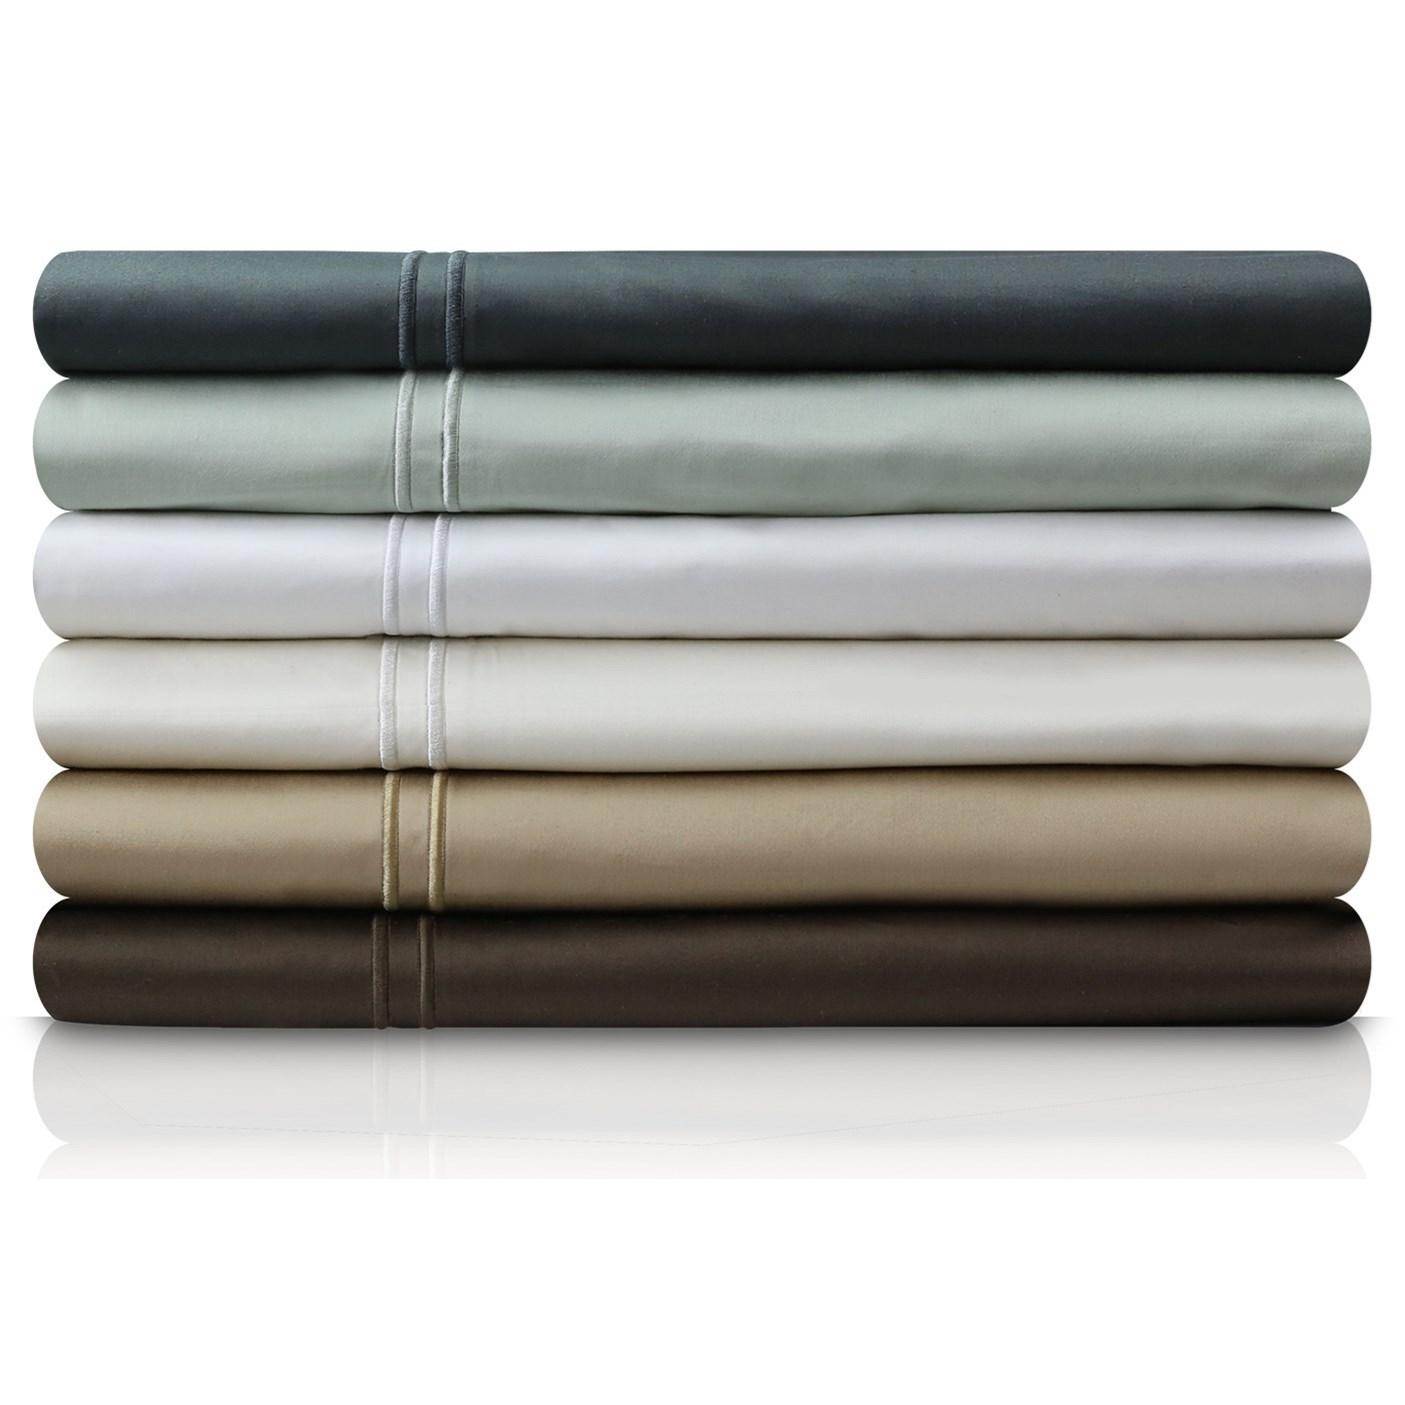 Malouf Egyptian Cotton Full XL 600 TC Egyptian Cotton Sheet Set - Item Number: MA06FXCHSS